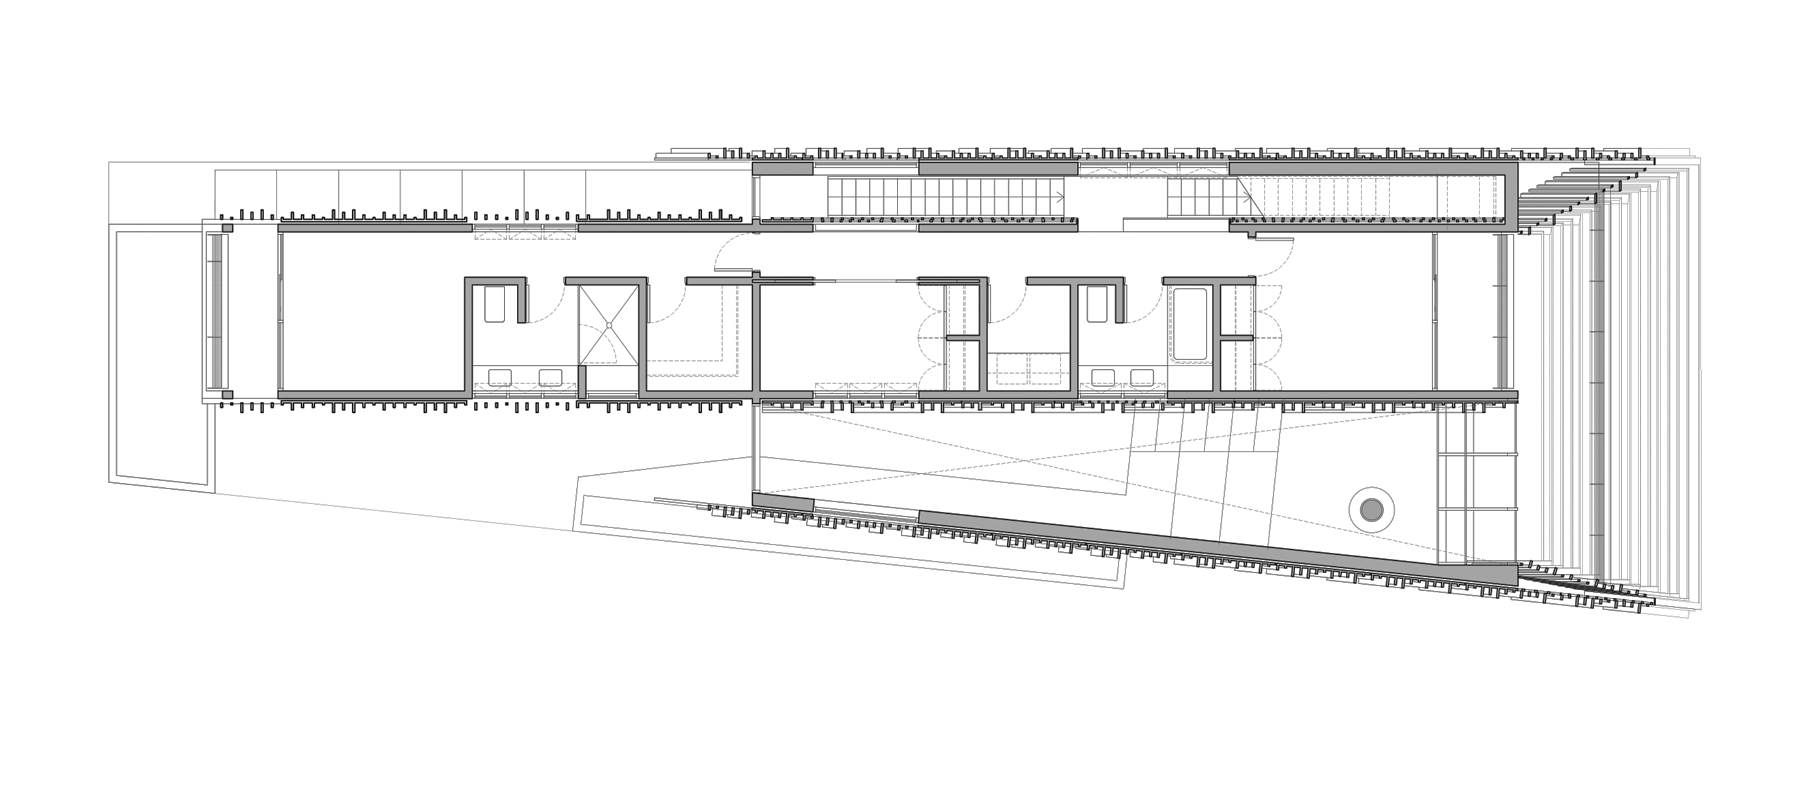 ................ second level floor plan ................